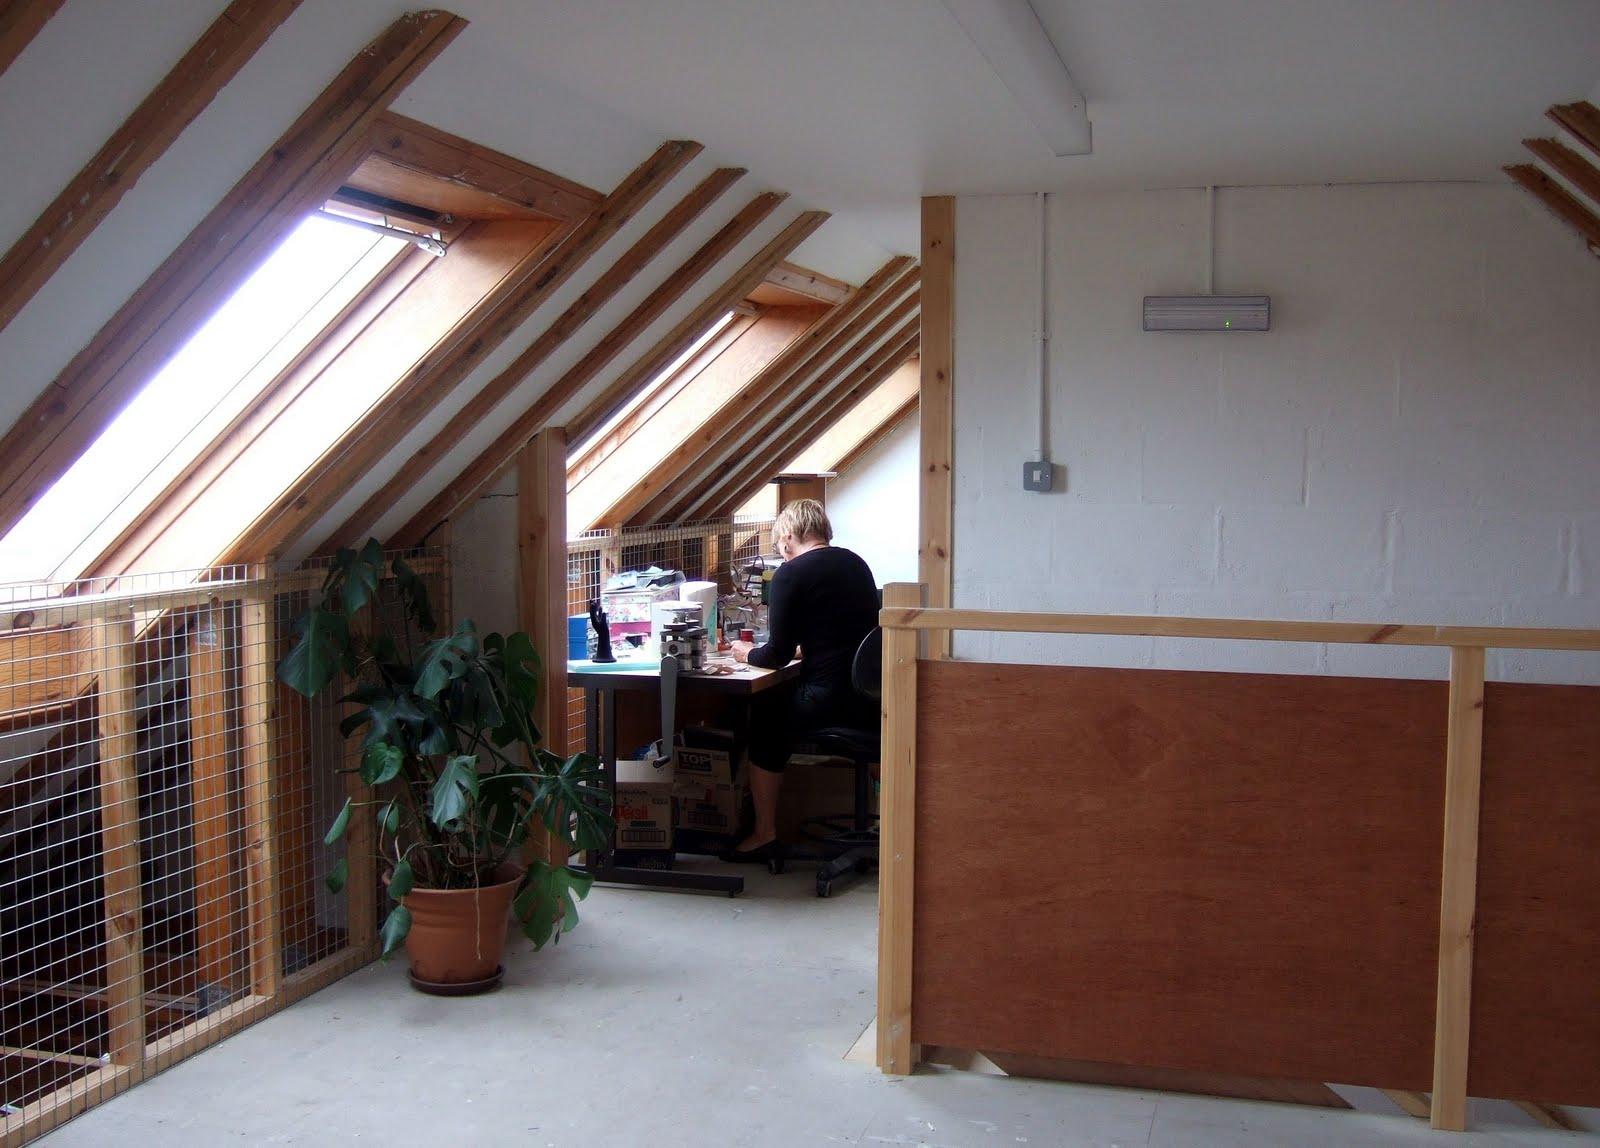 ayrshire scotland business news. Black Bedroom Furniture Sets. Home Design Ideas